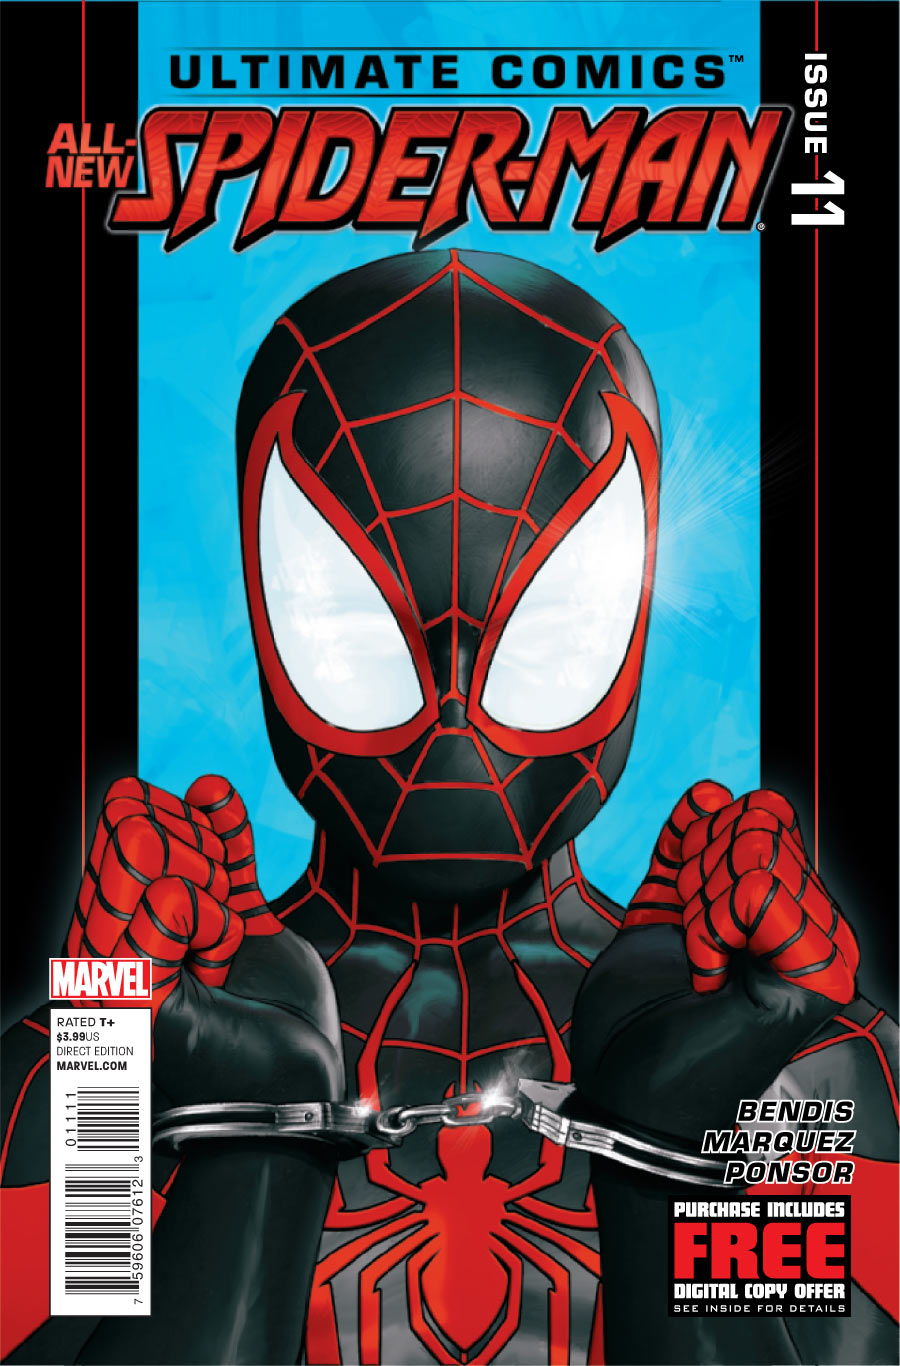 Ultimate Comics - Spider-Man 11